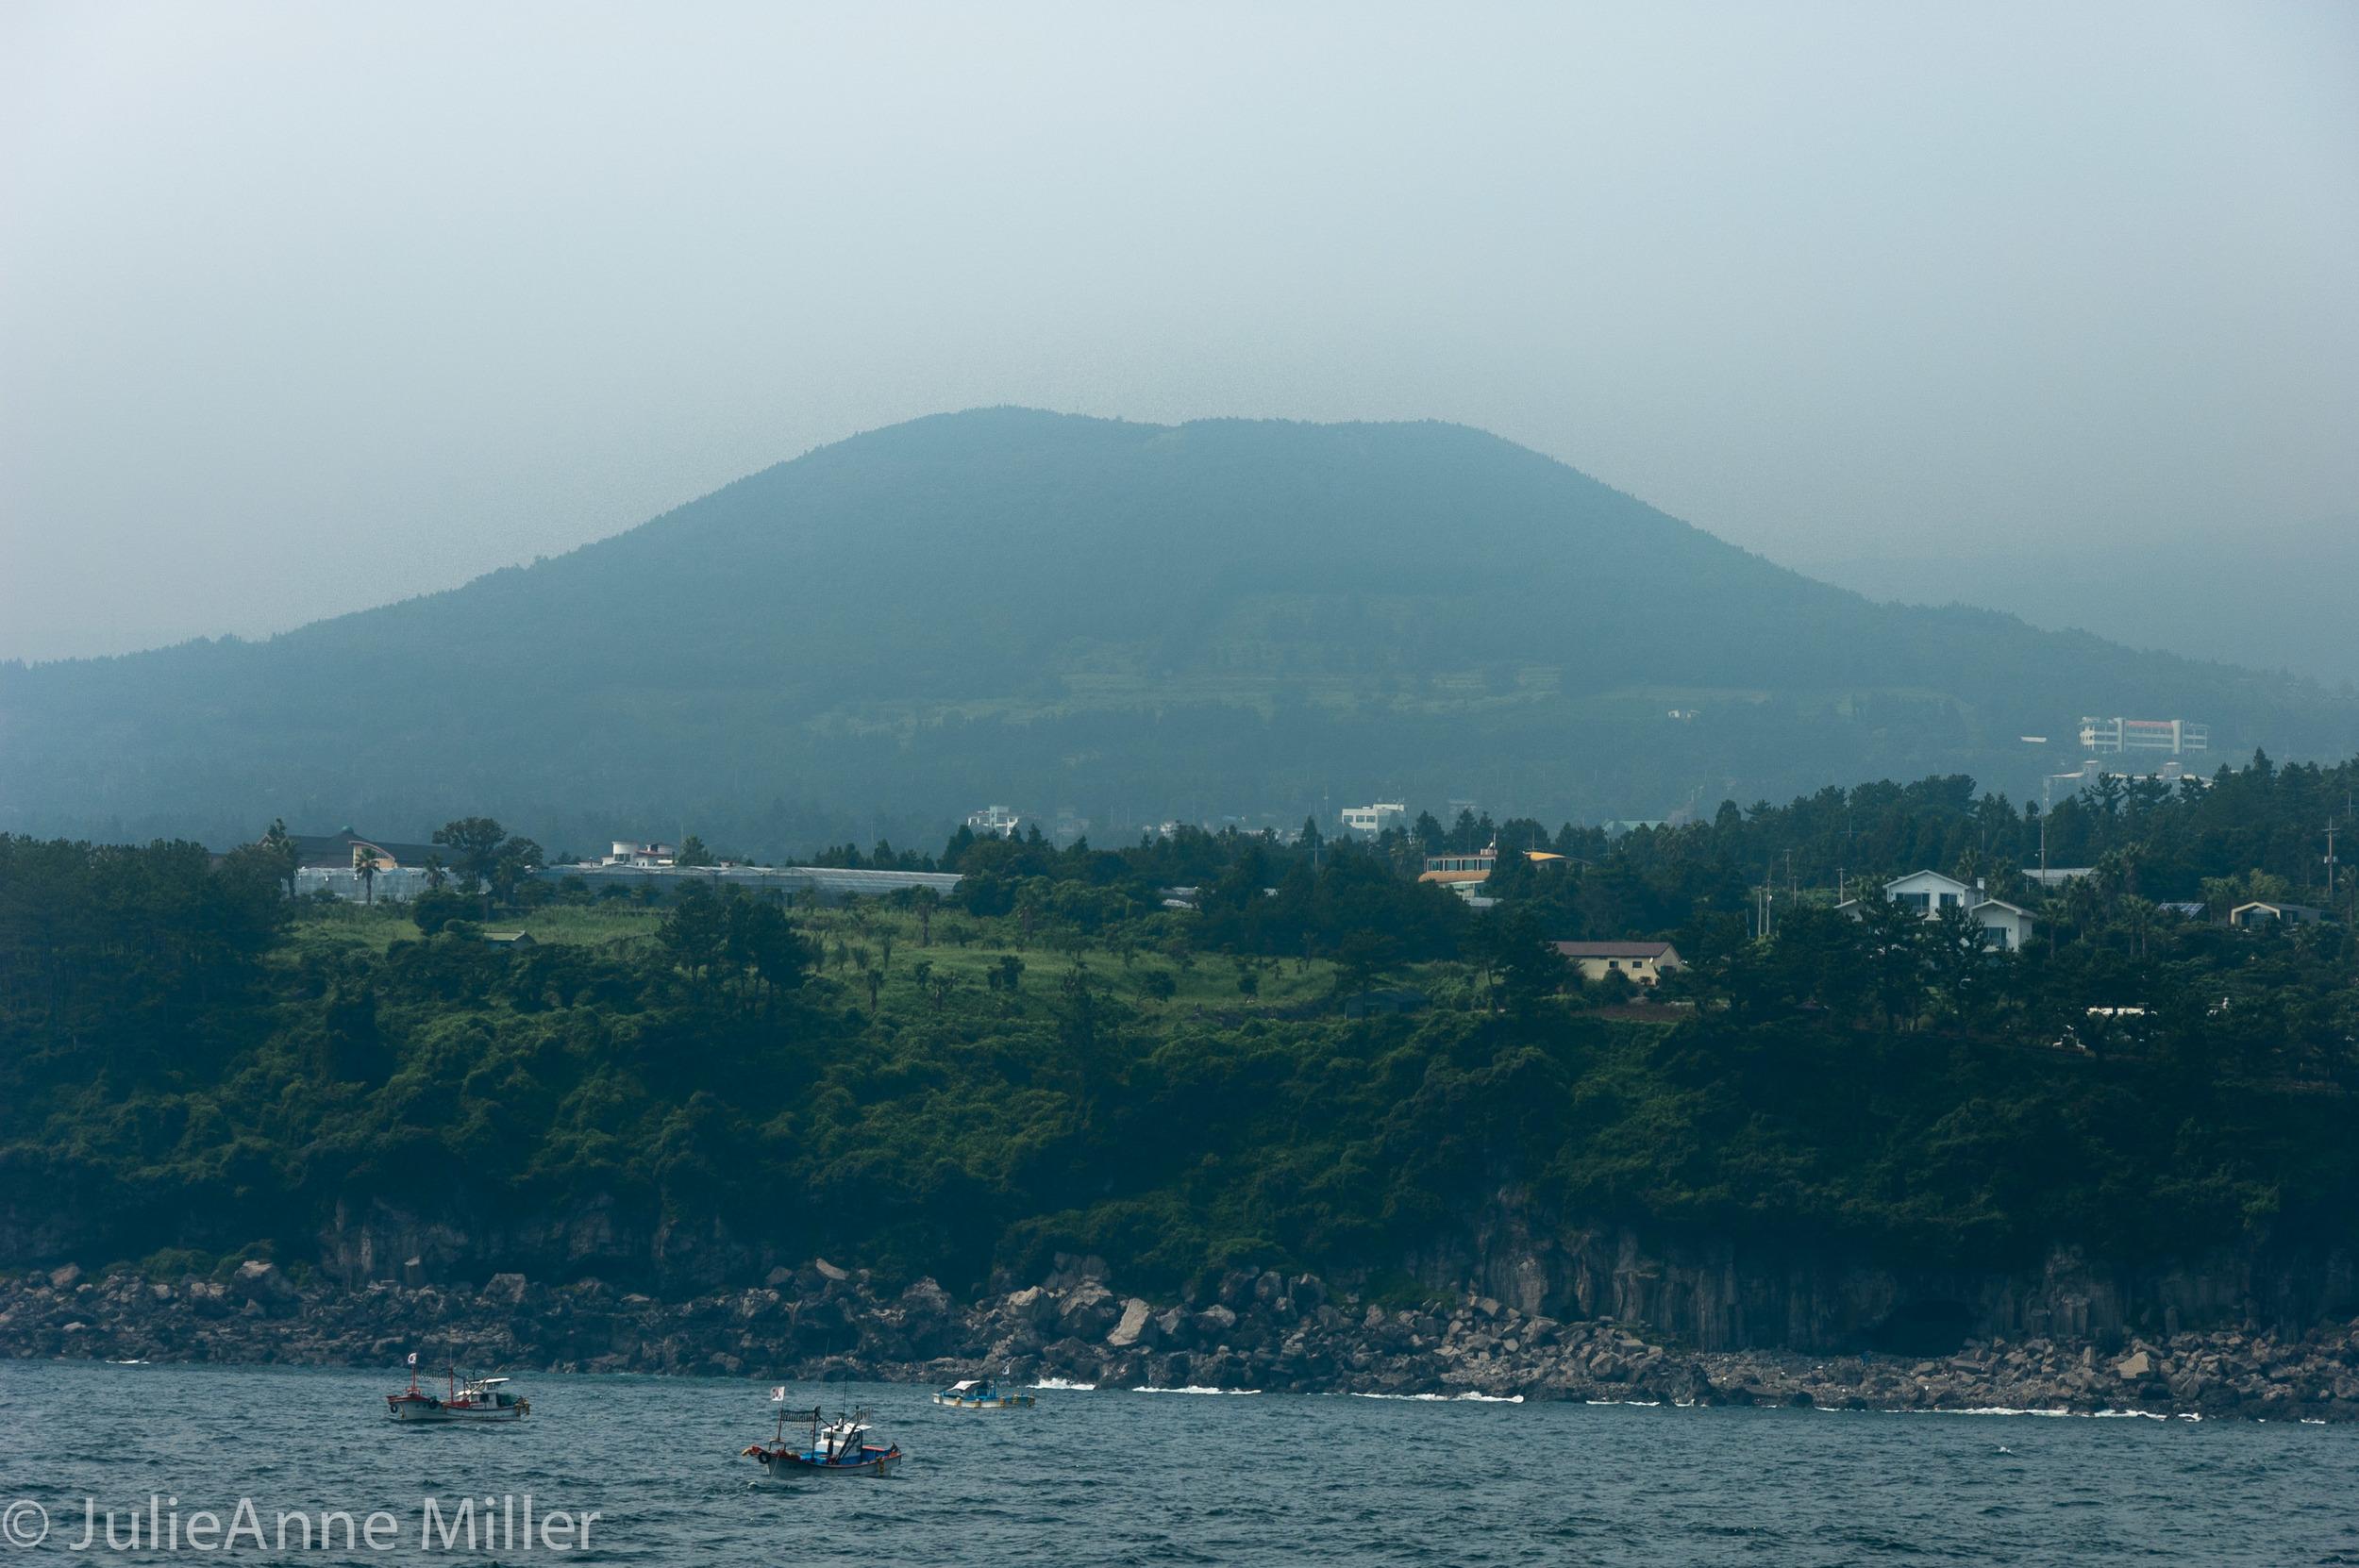 view of Halla San